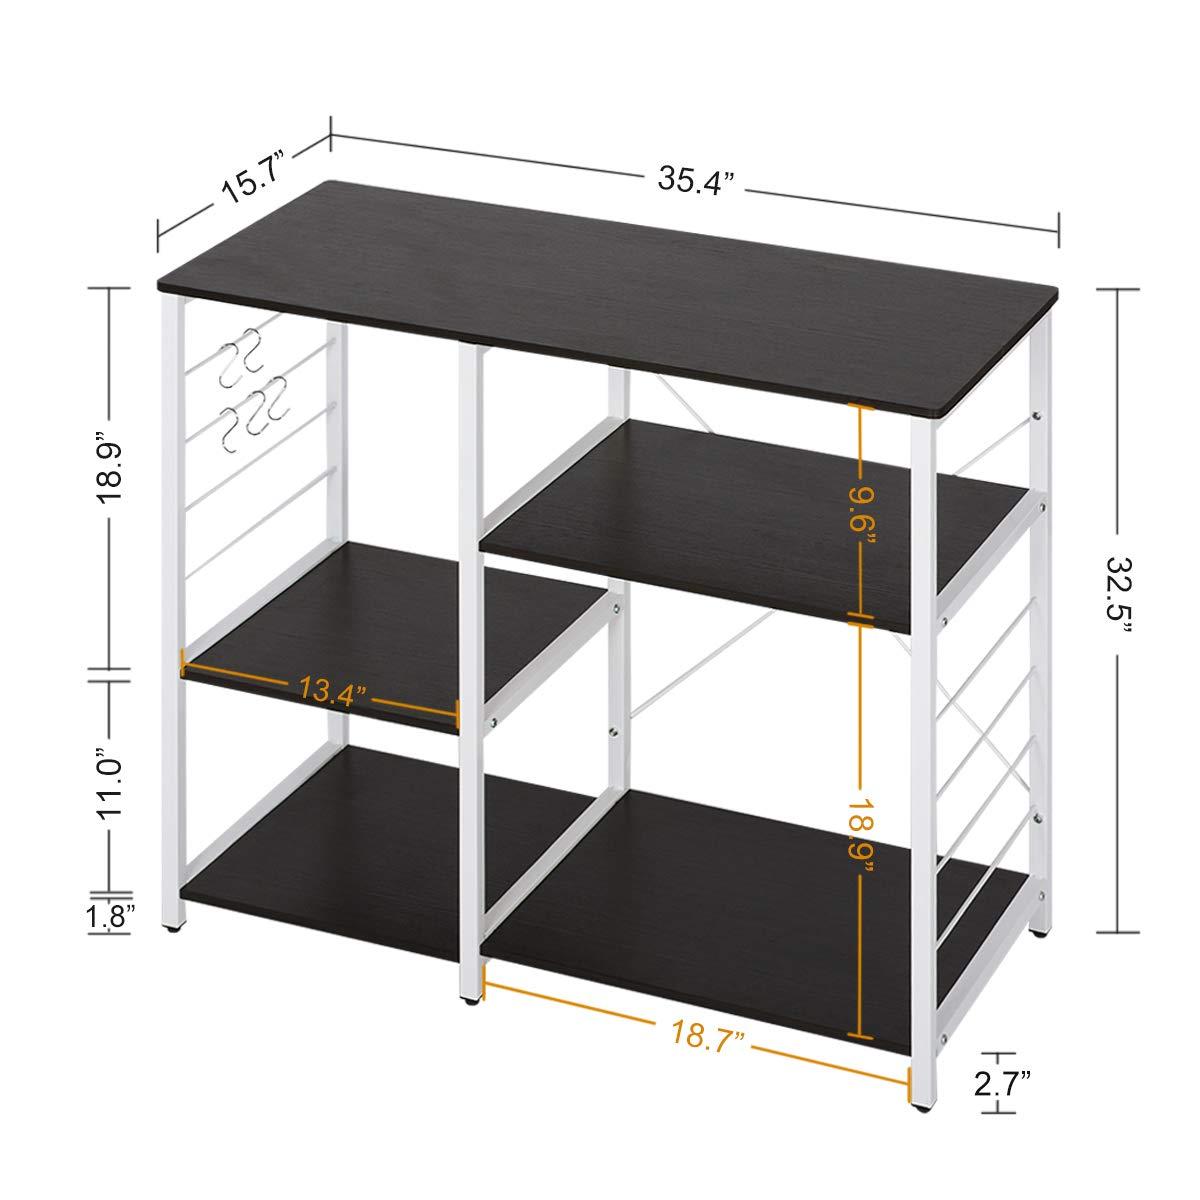 WLIVE Multi-Purpose Wood Kitchen Cart (Black) by WLIVE (Image #2)